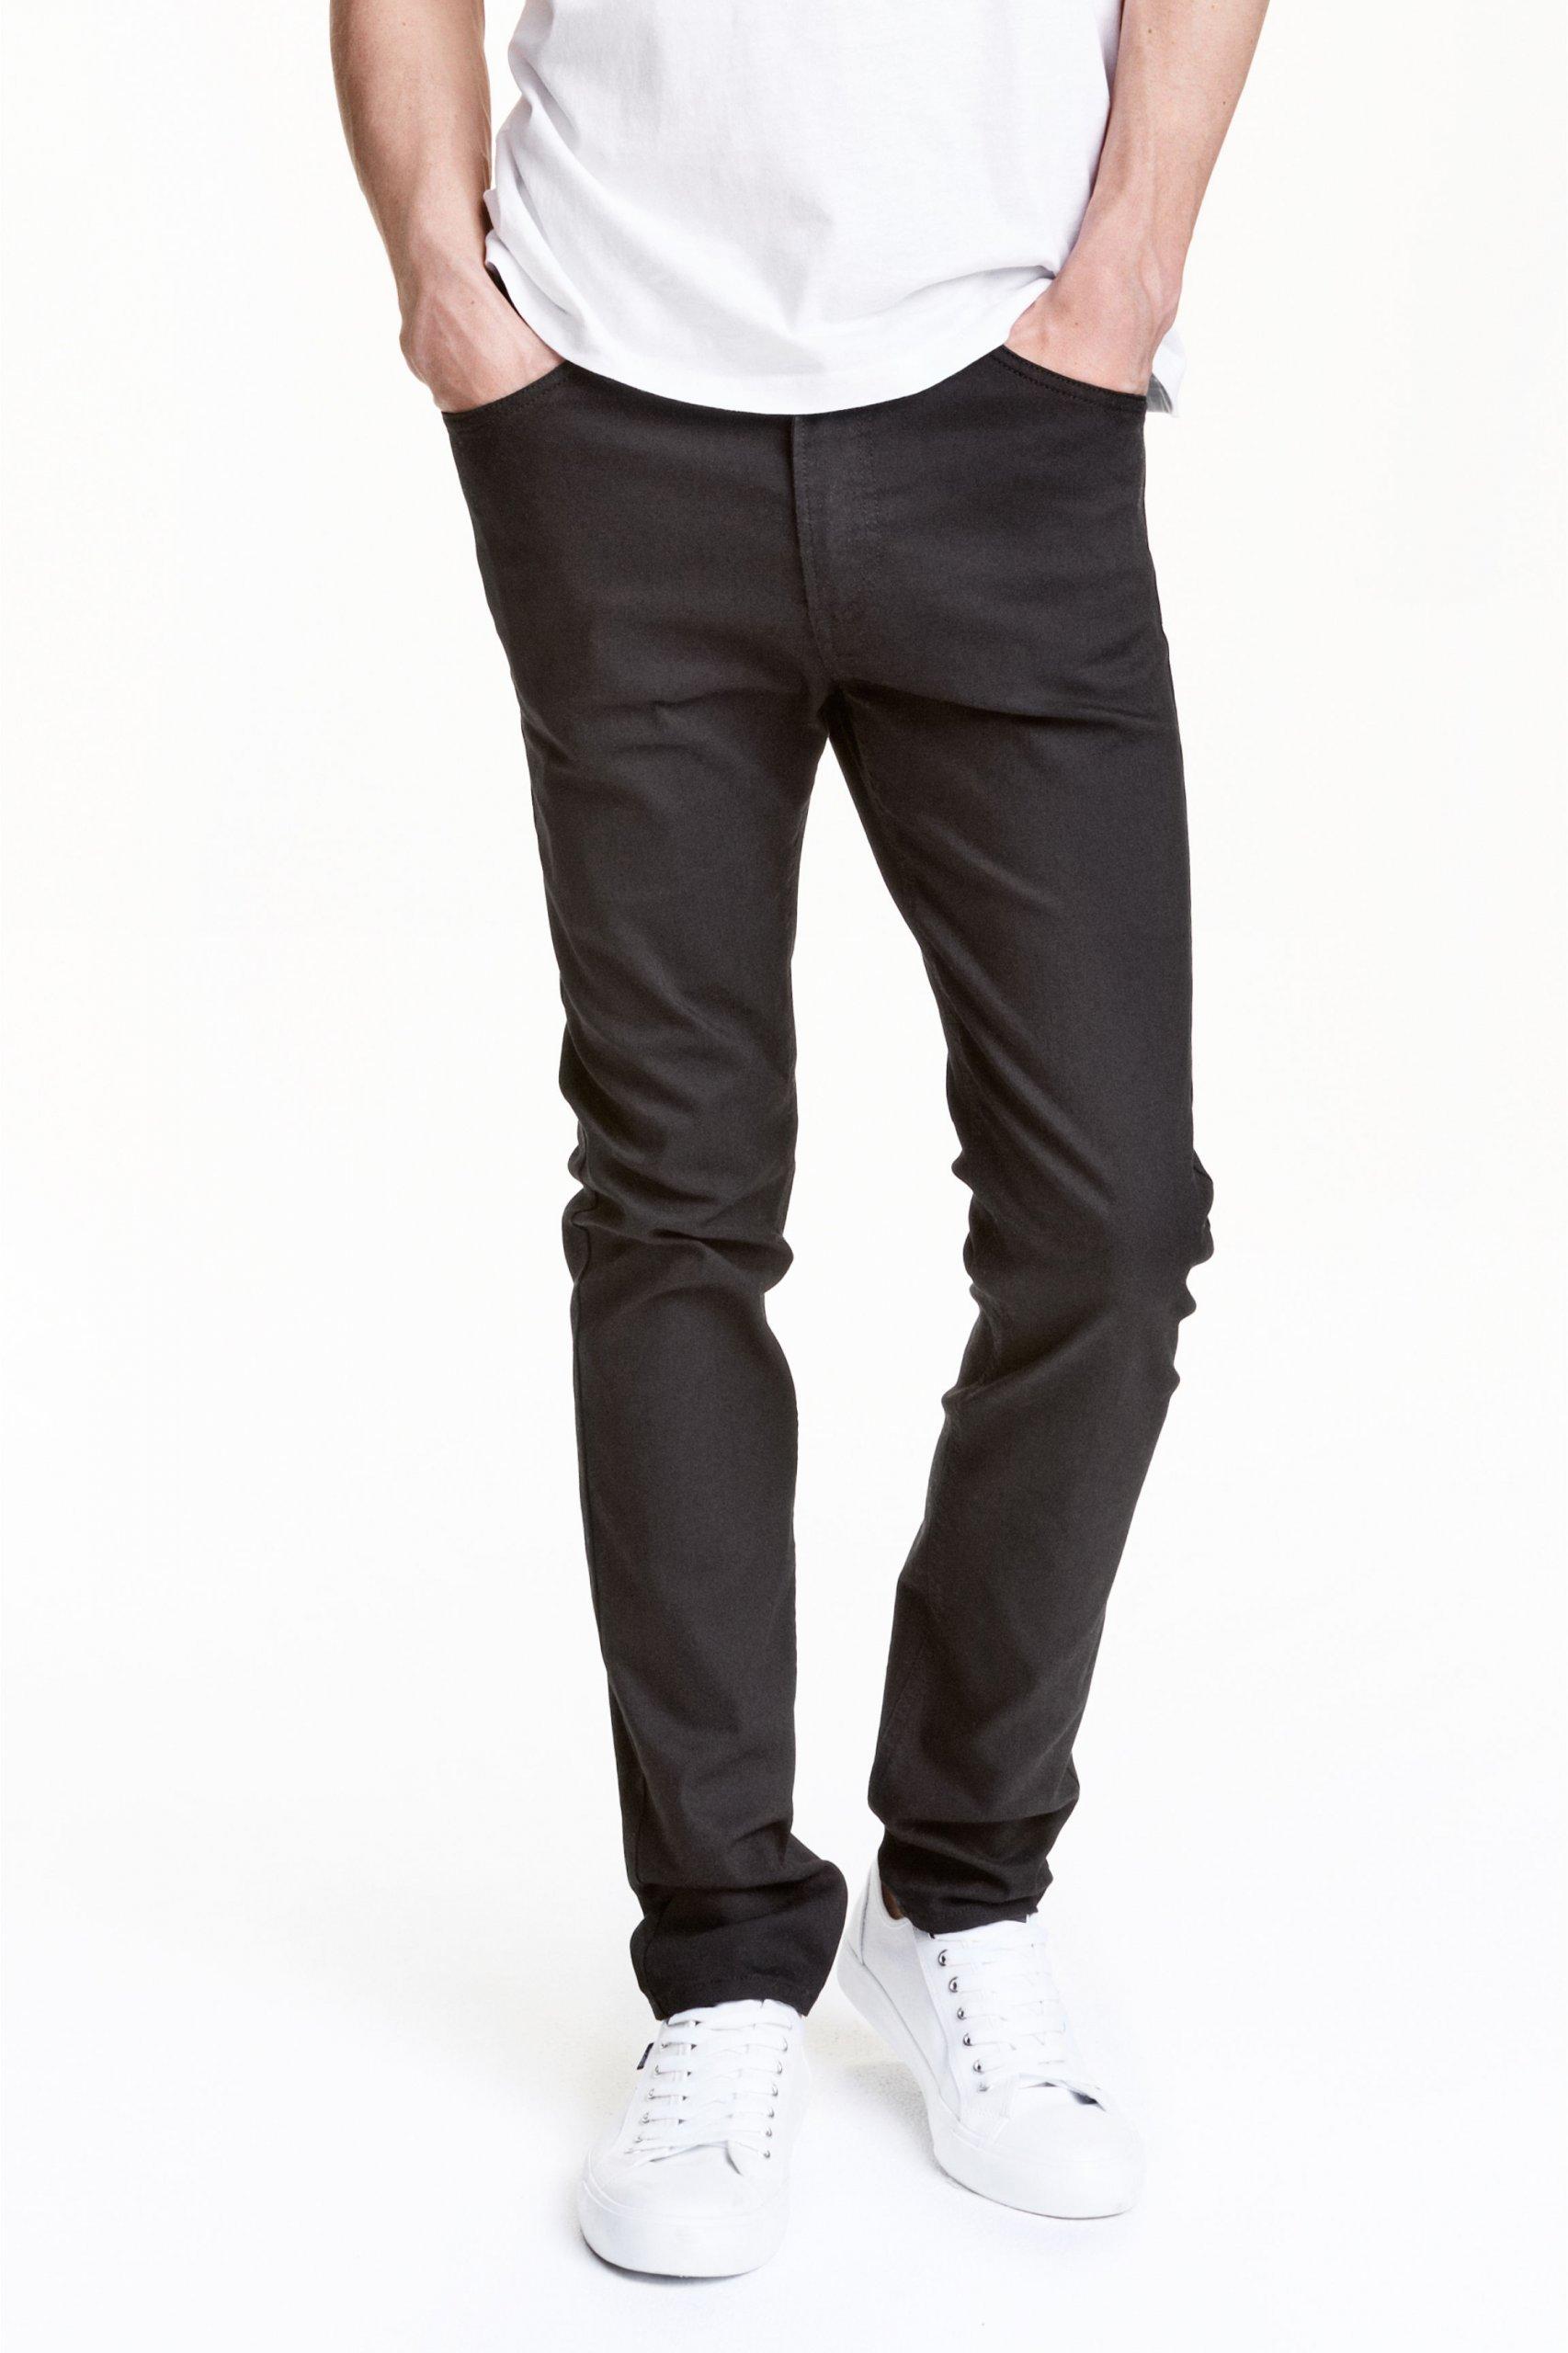 H&M DIVIDED spodnie SKINNY FIT LEG czerń W36 R